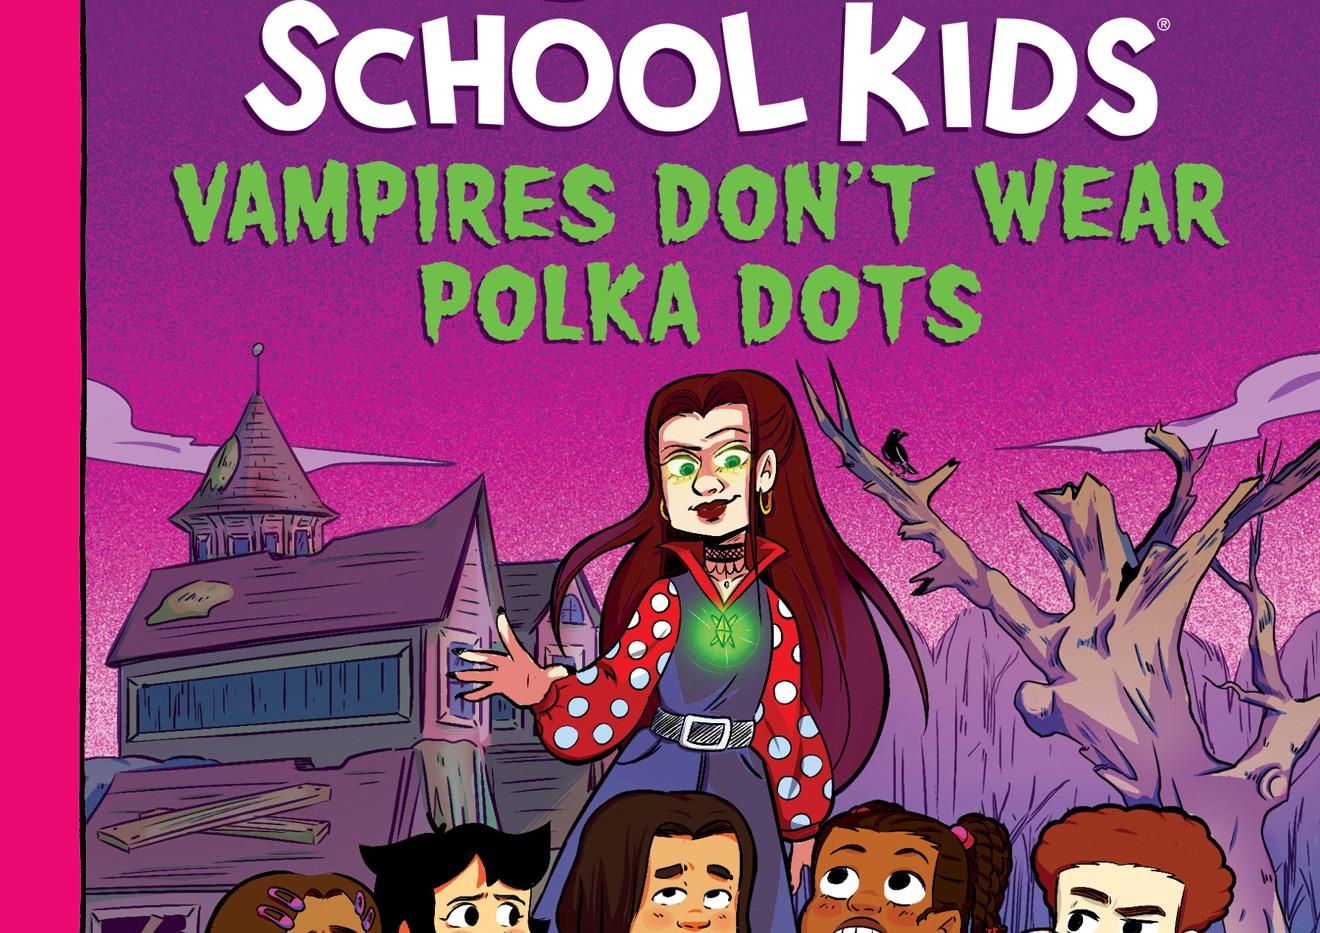 Vampires Don't Wear Polka Dots Cover.jpg